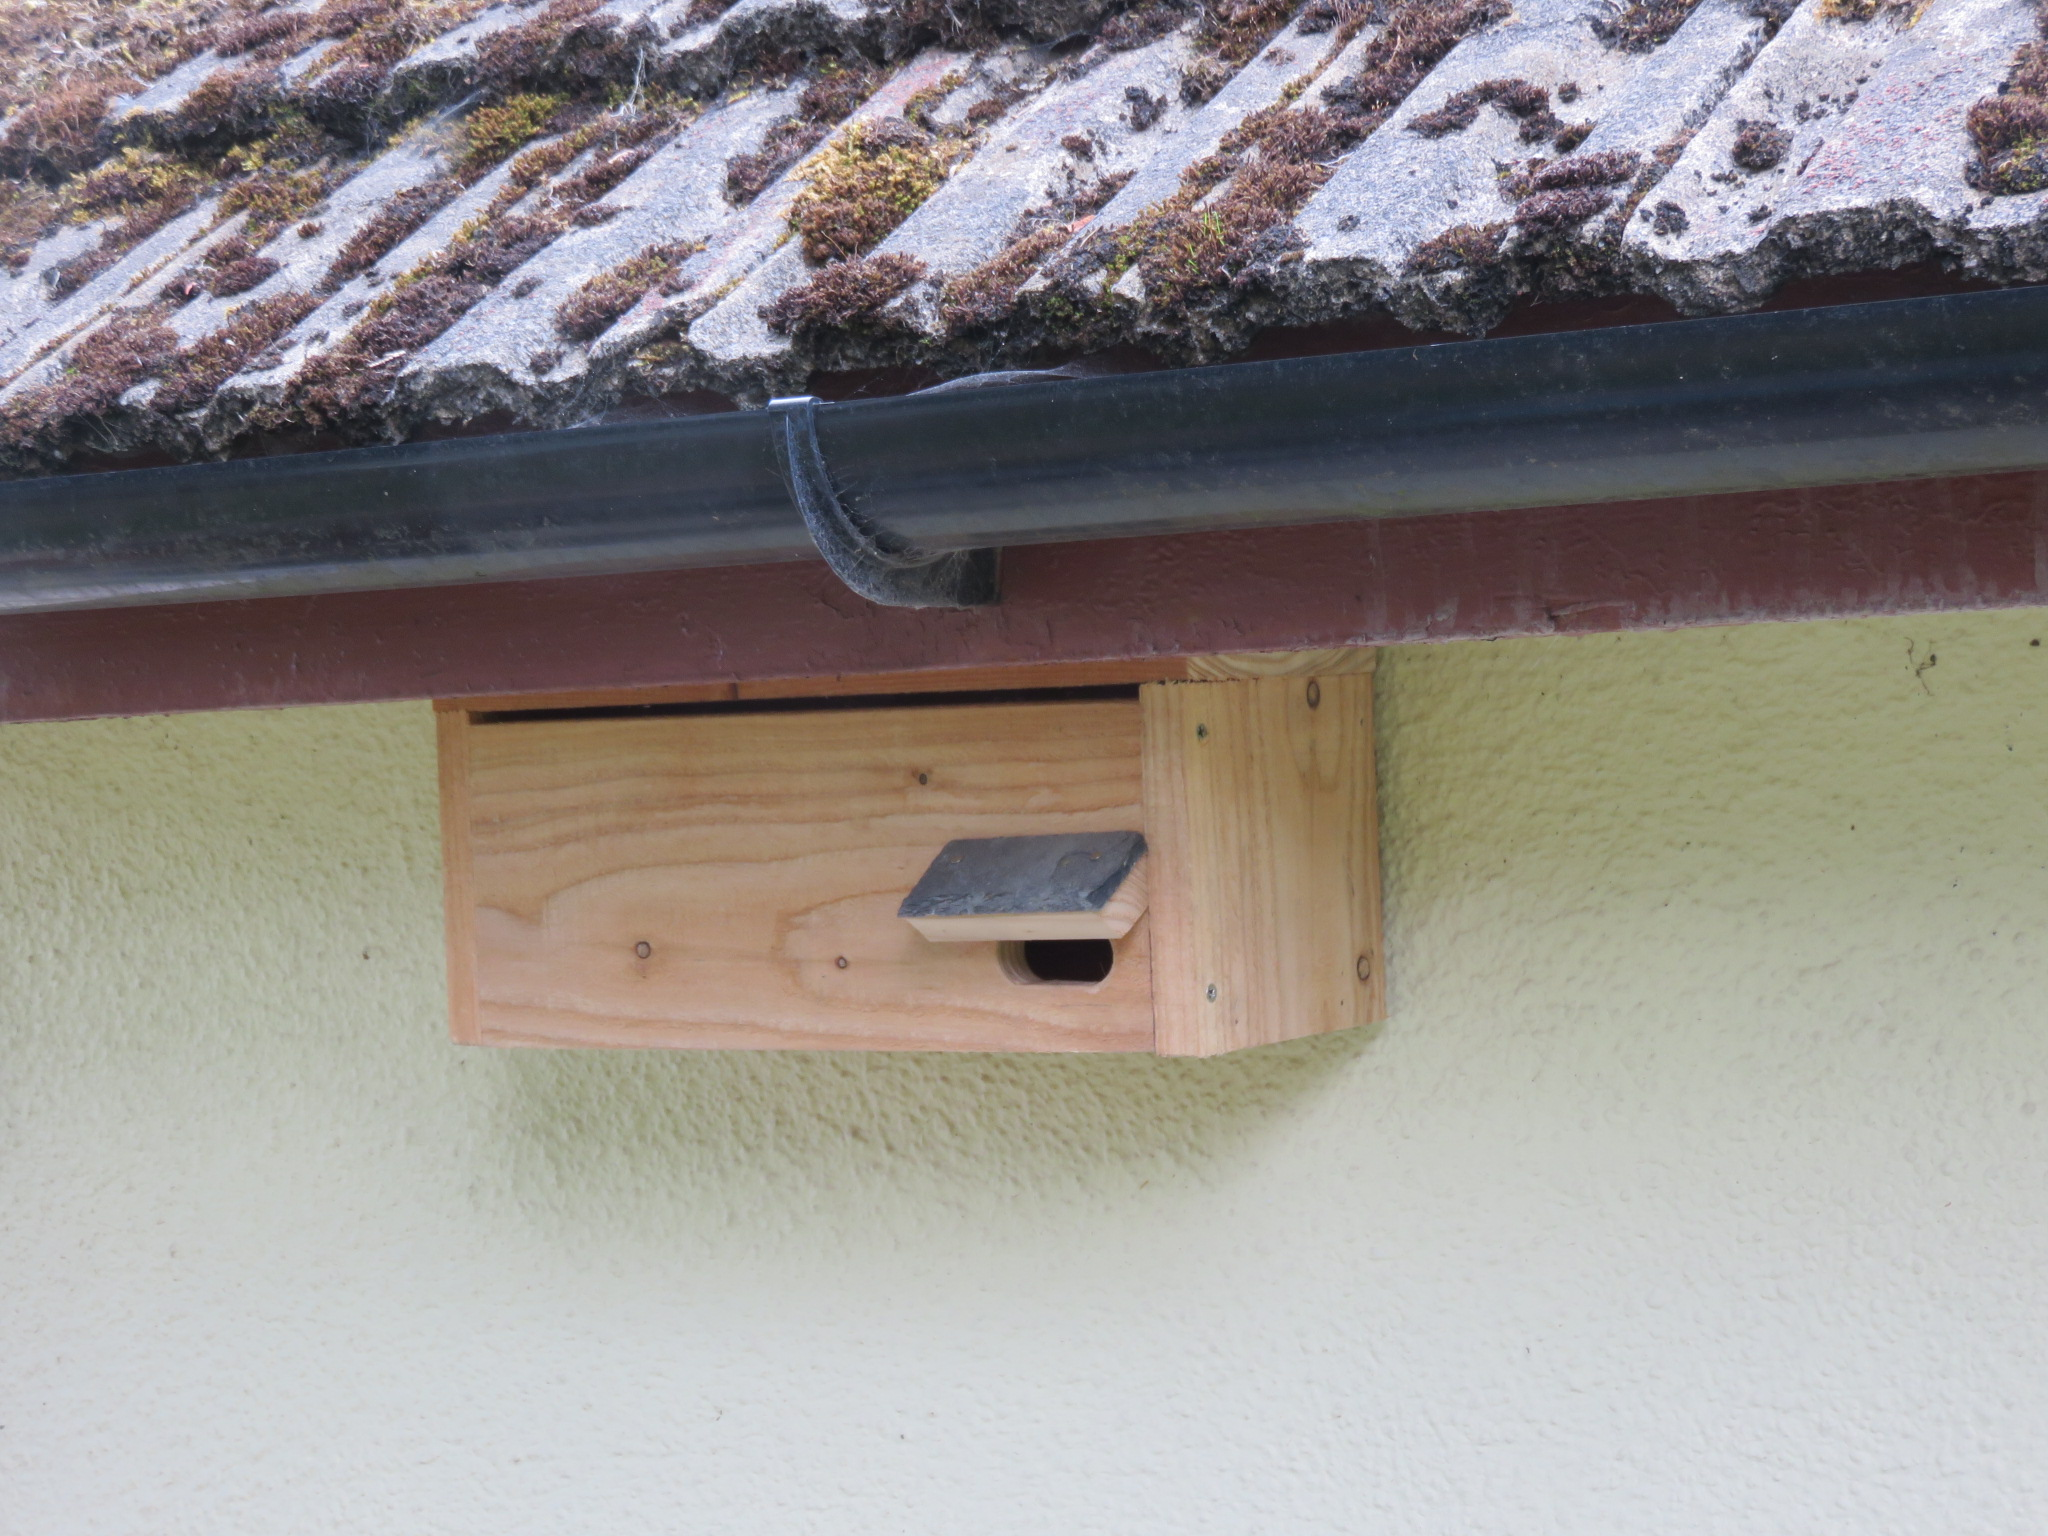 Common swift box